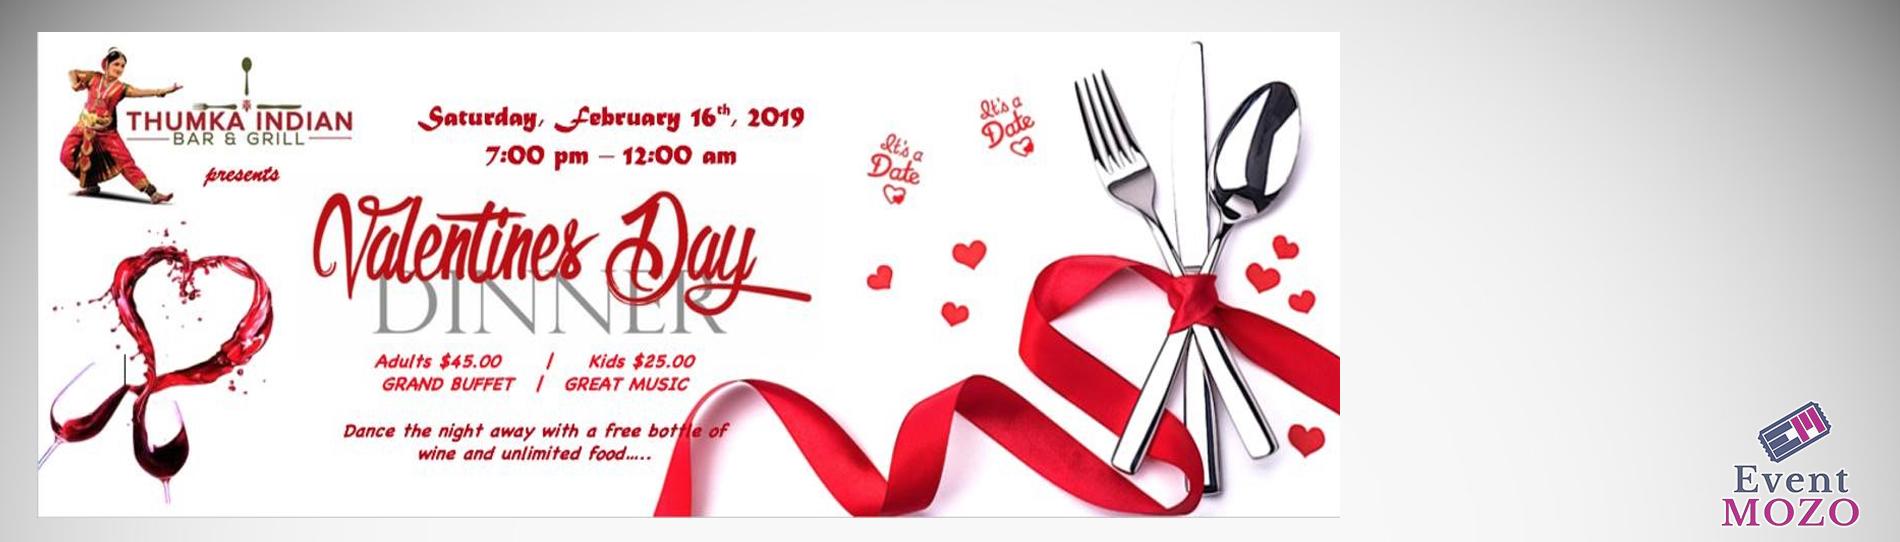 EventMozo Valentine's Day Dinner - Thumka Indian Bar & Grill